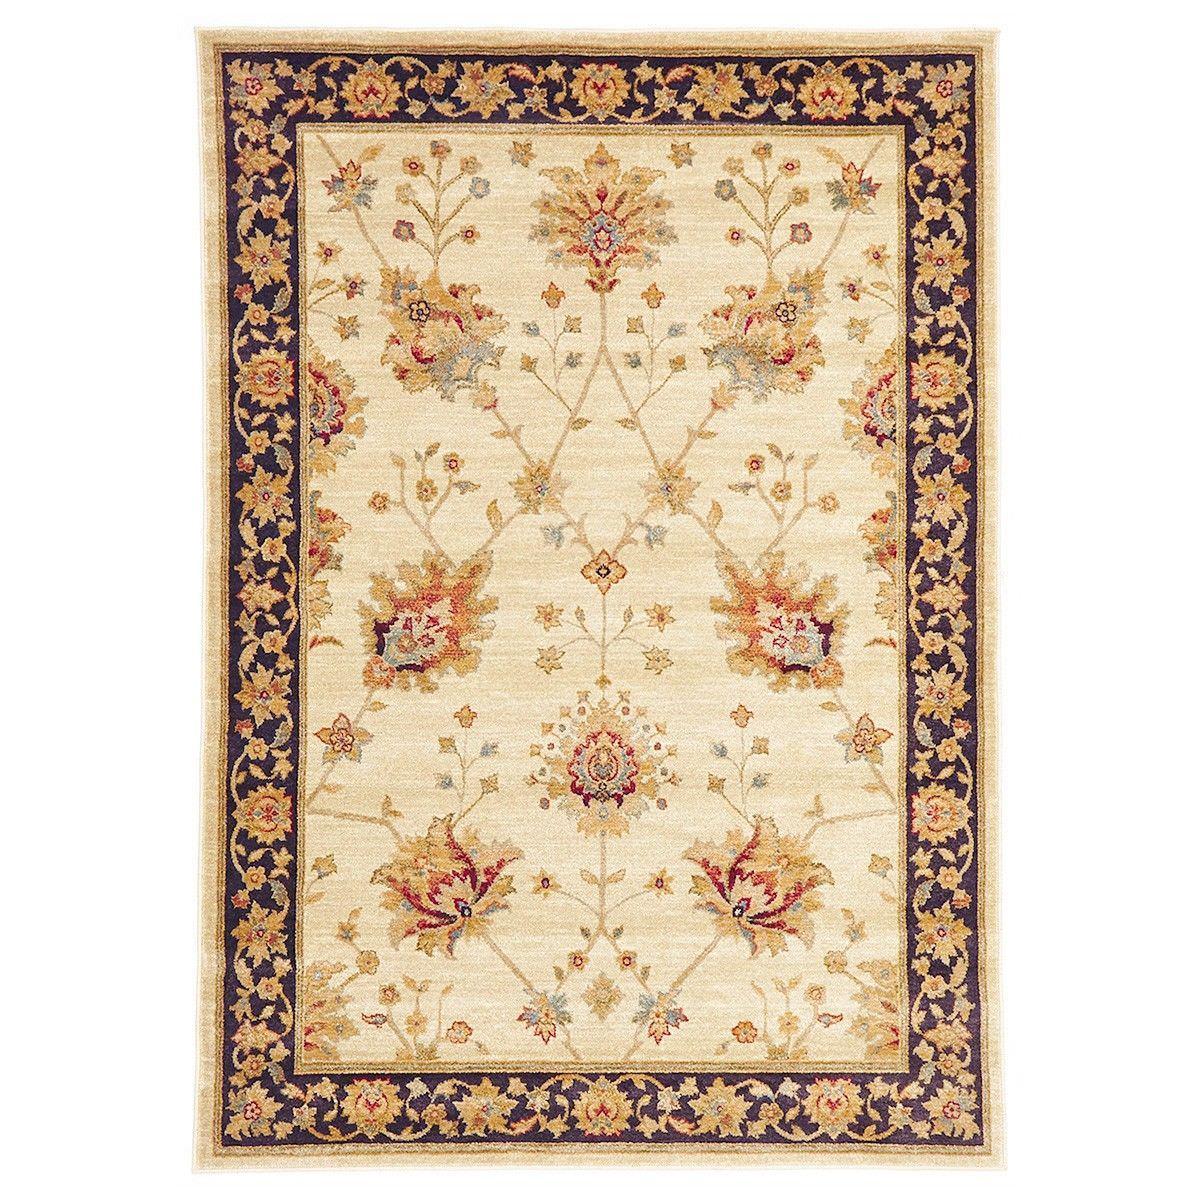 Byblos Classic Egyptian Made Oriental Rug, 330x240cm, Cream